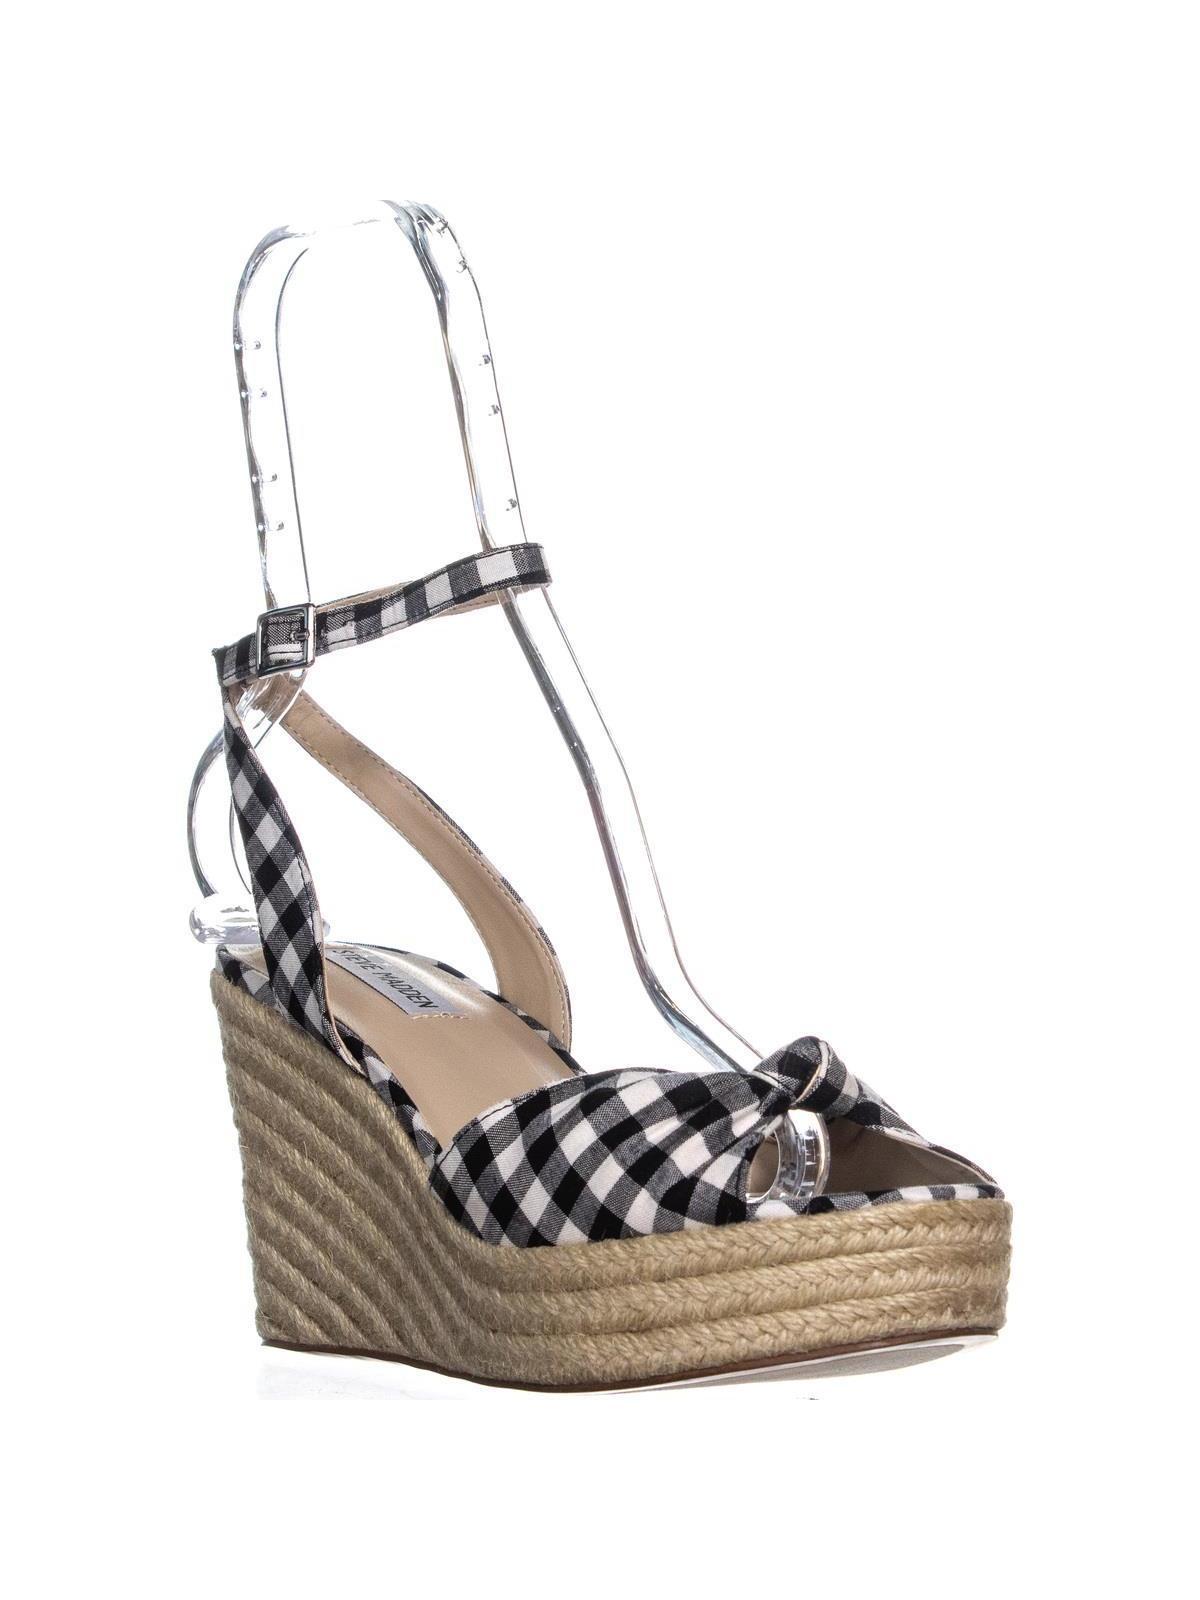 Womens Steve Madden Valinda Peep Toe Espadrilles Wedge Sandals, Black Gingham